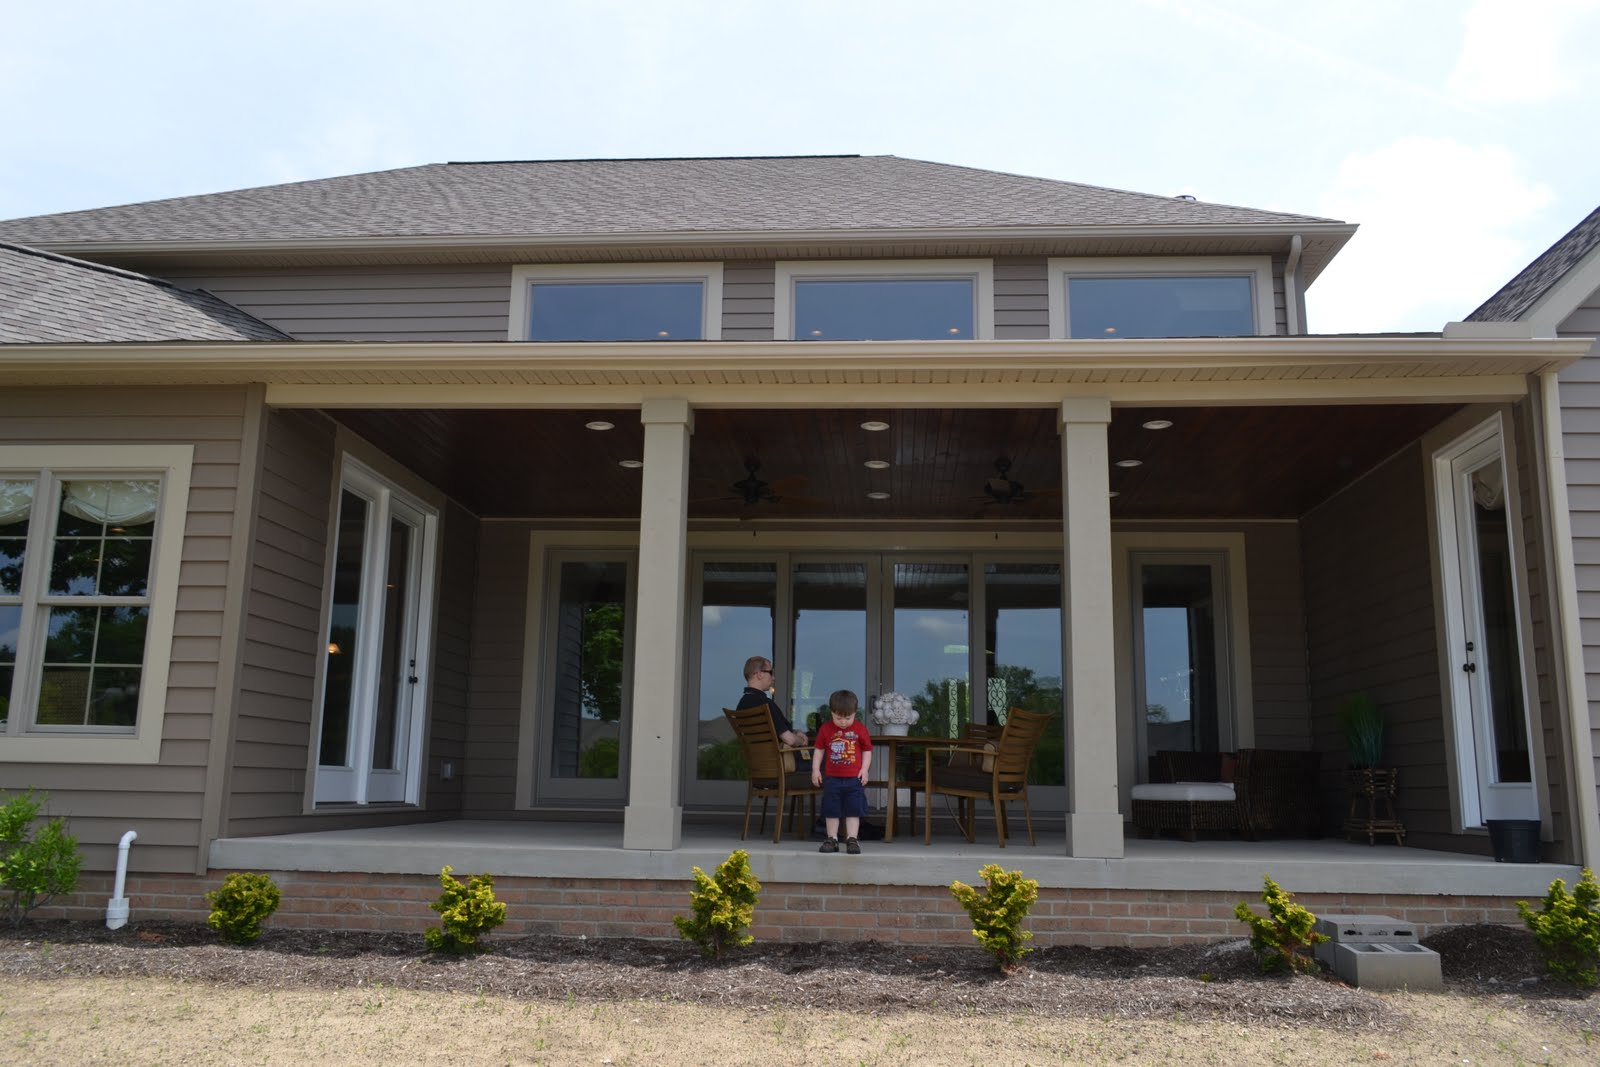 Covered Back Porch Designs | Joy Studio Design Gallery ... on Covered Back Deck Designs id=31228